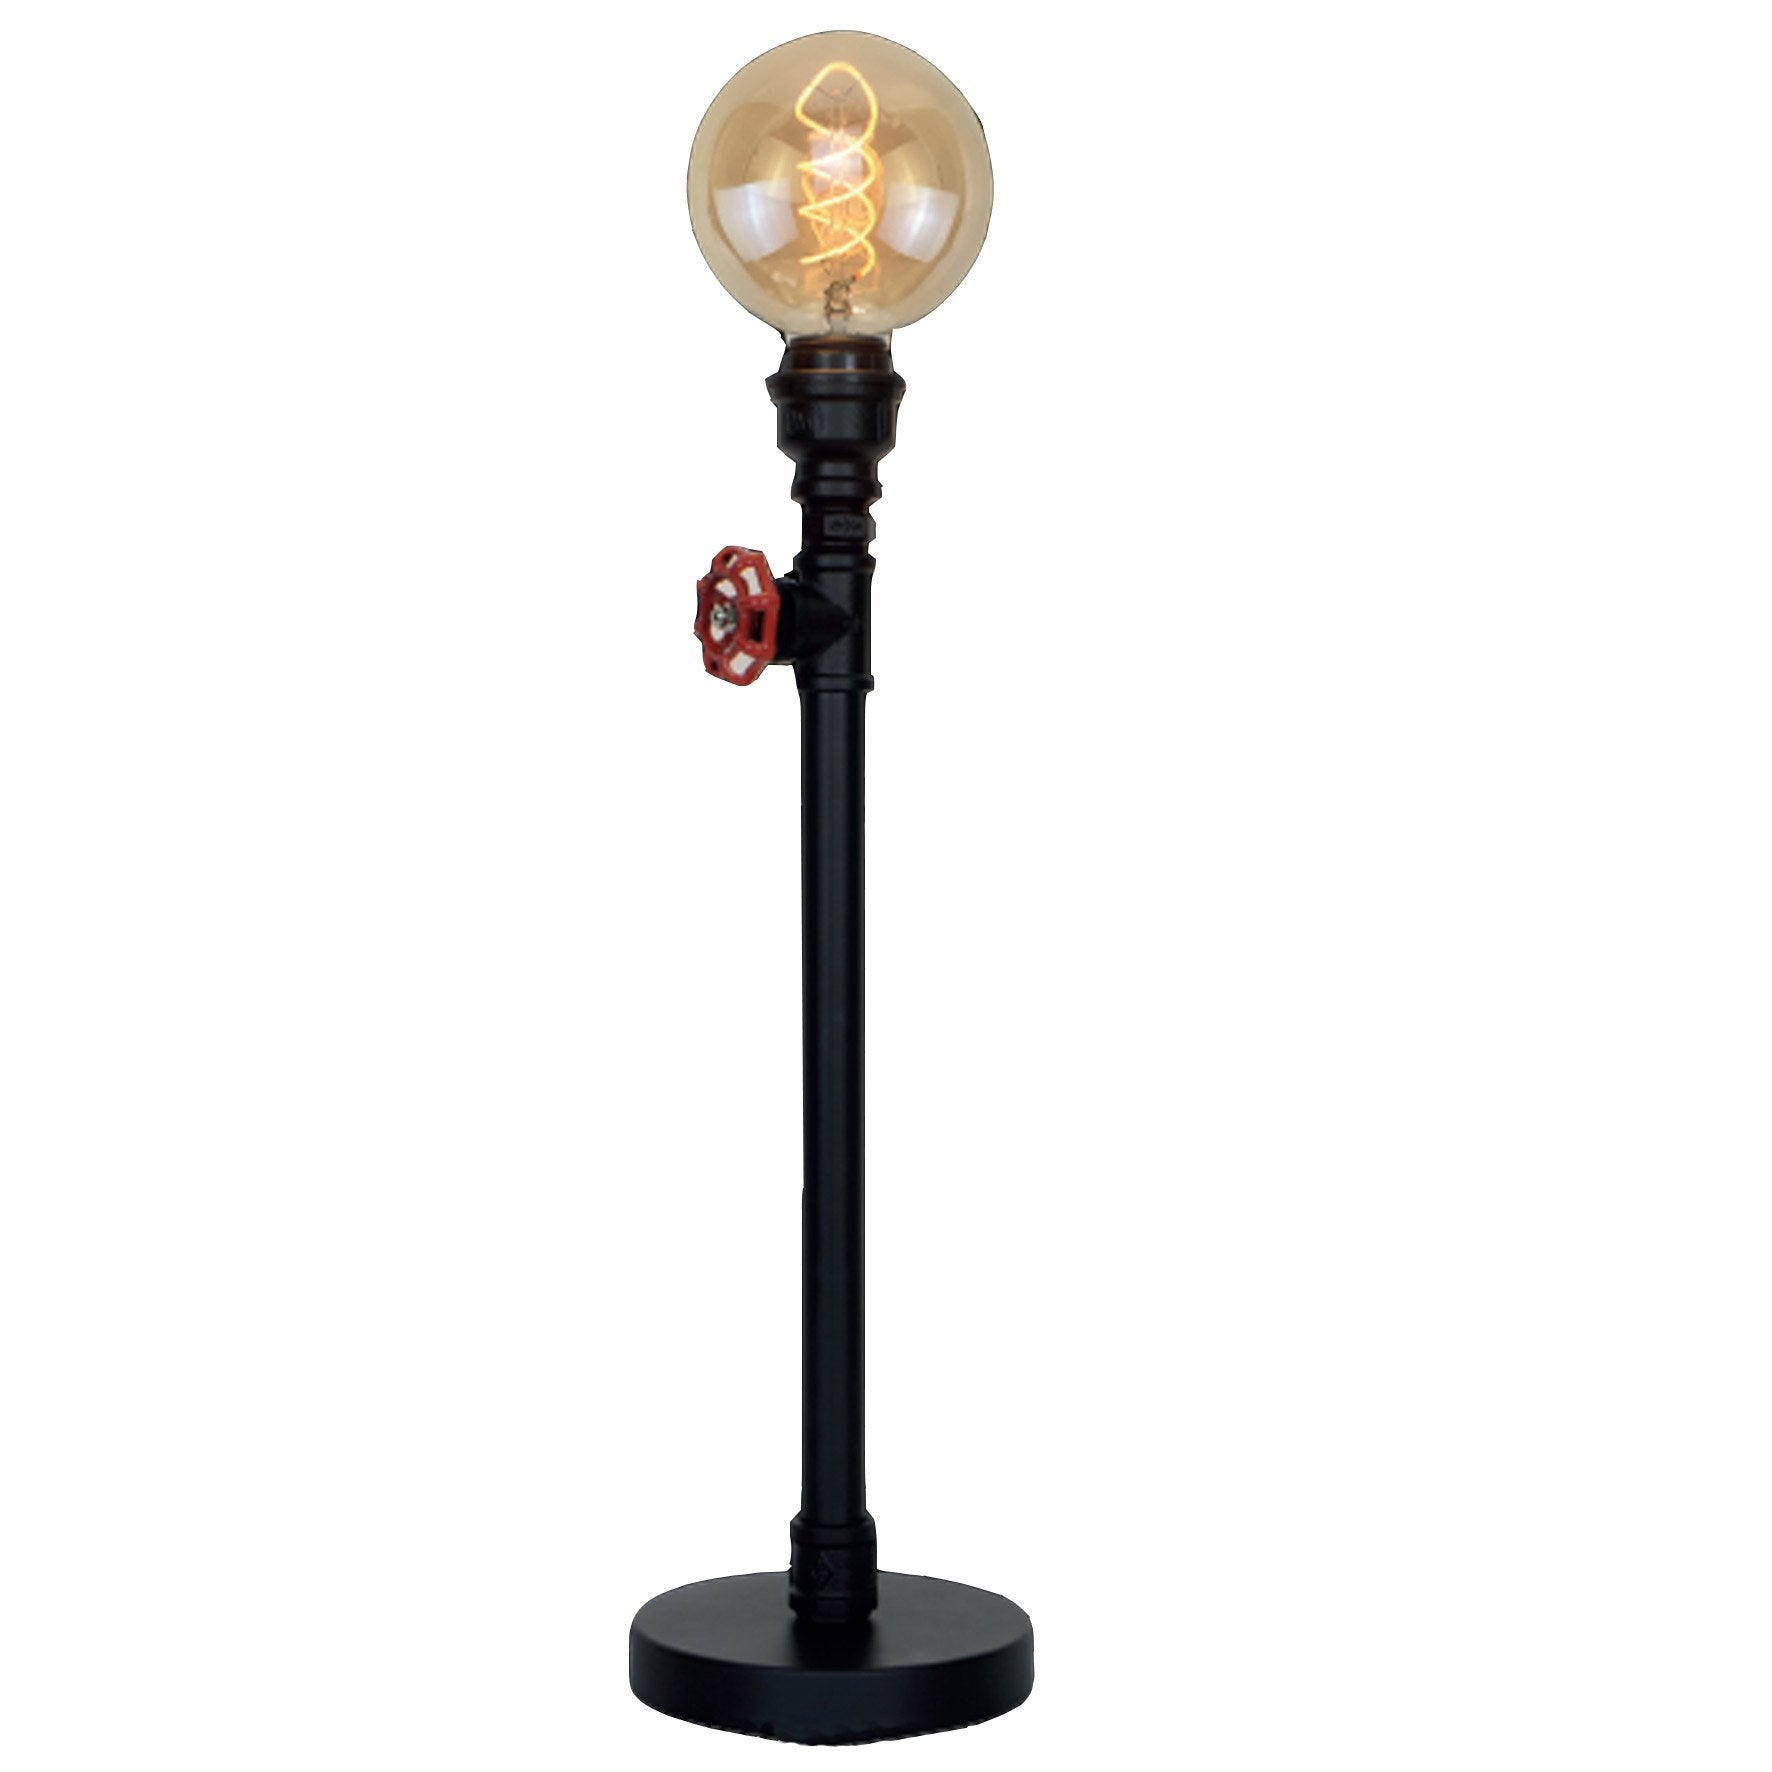 Lampadaire Robin, SAMPA HELIOS, E27, noir, 120 cm